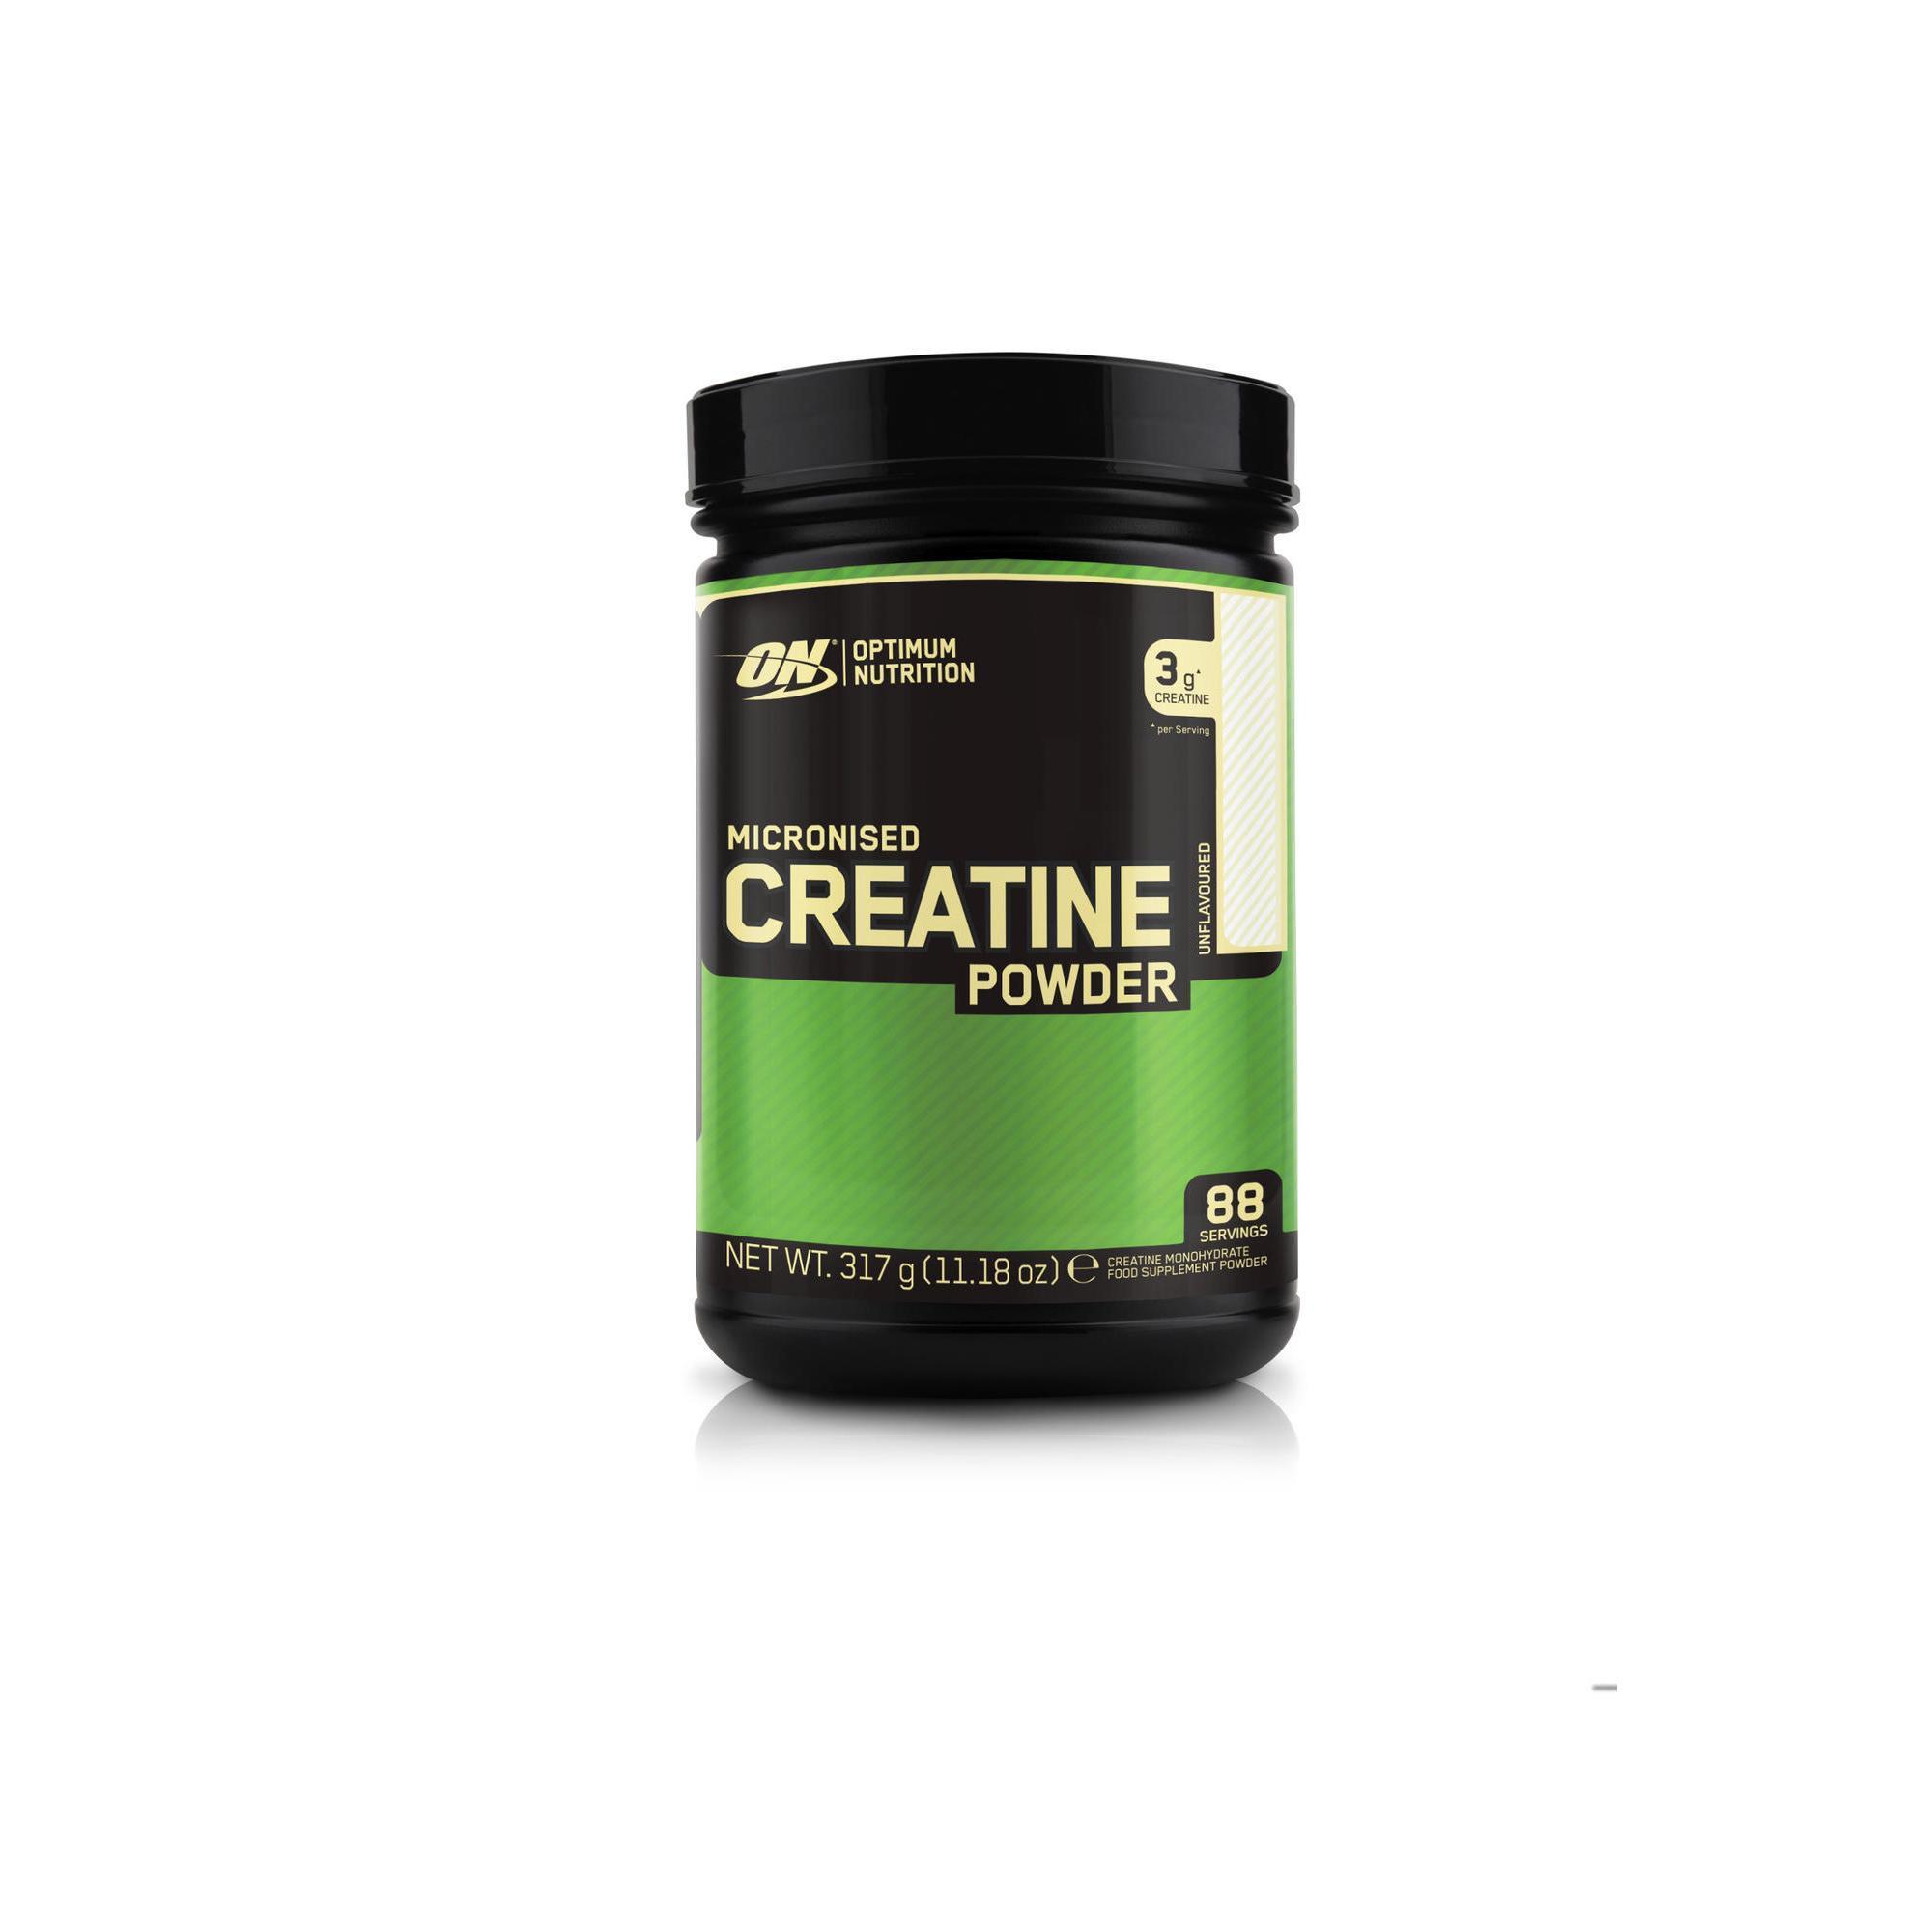 Kreatin-Pulver Optimum 317 g